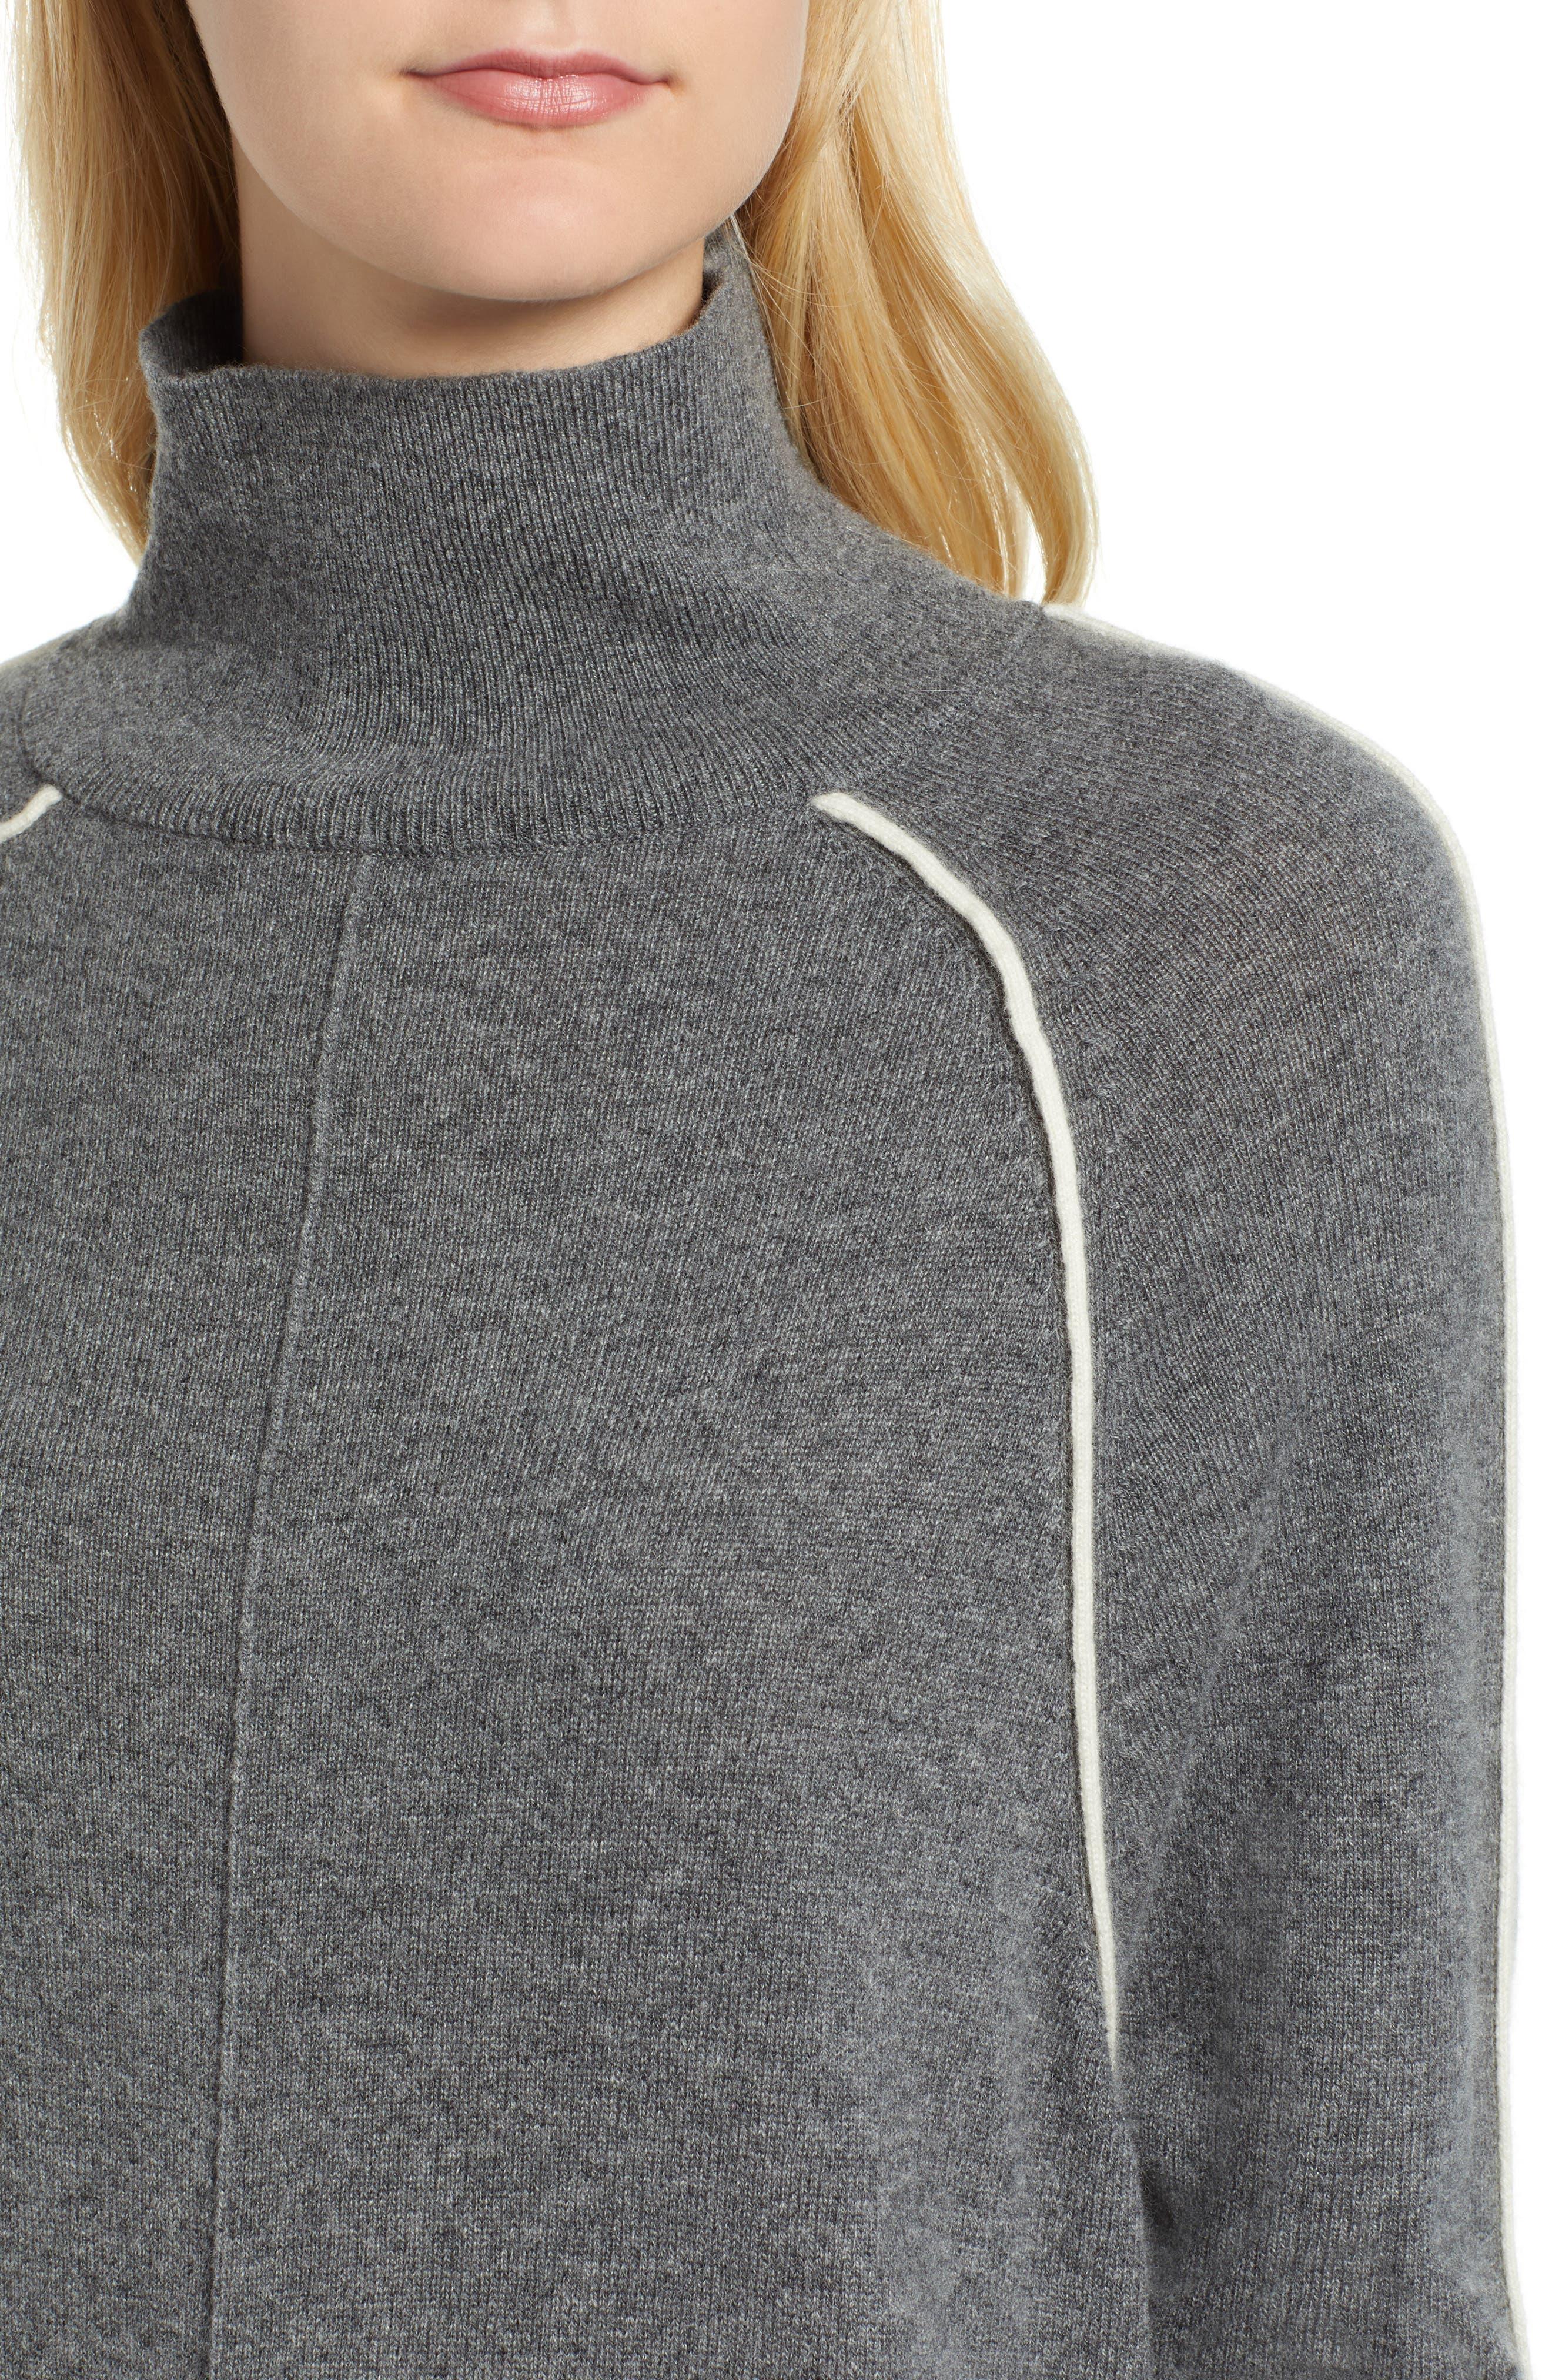 Raglan Sleeve Cashmere Turtleneck,                             Alternate thumbnail 4, color,                             061